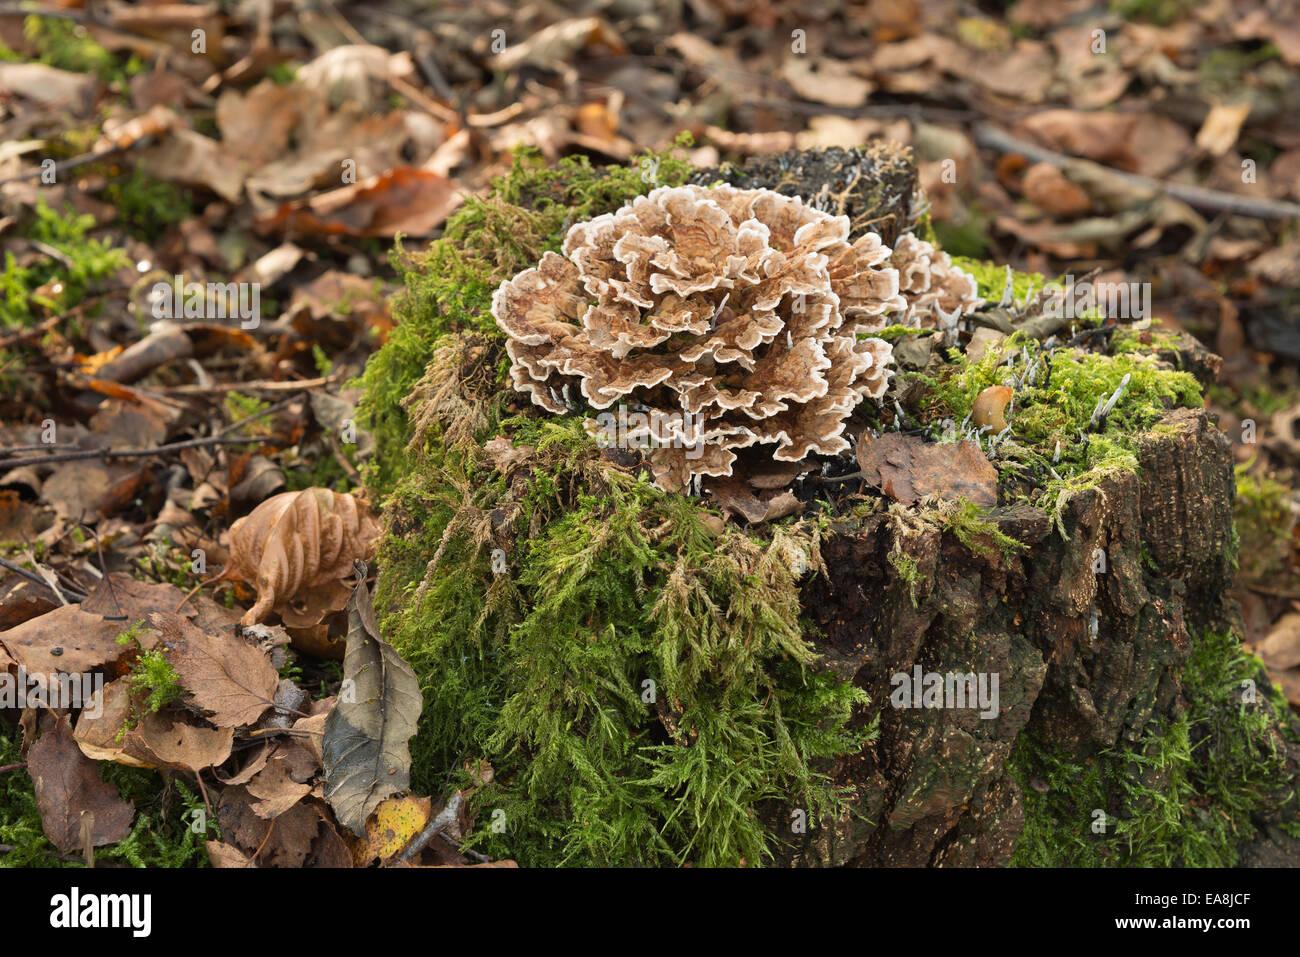 polypore bracket mushroom on top of rotting silver birch tree stump in autumn - Stock Image